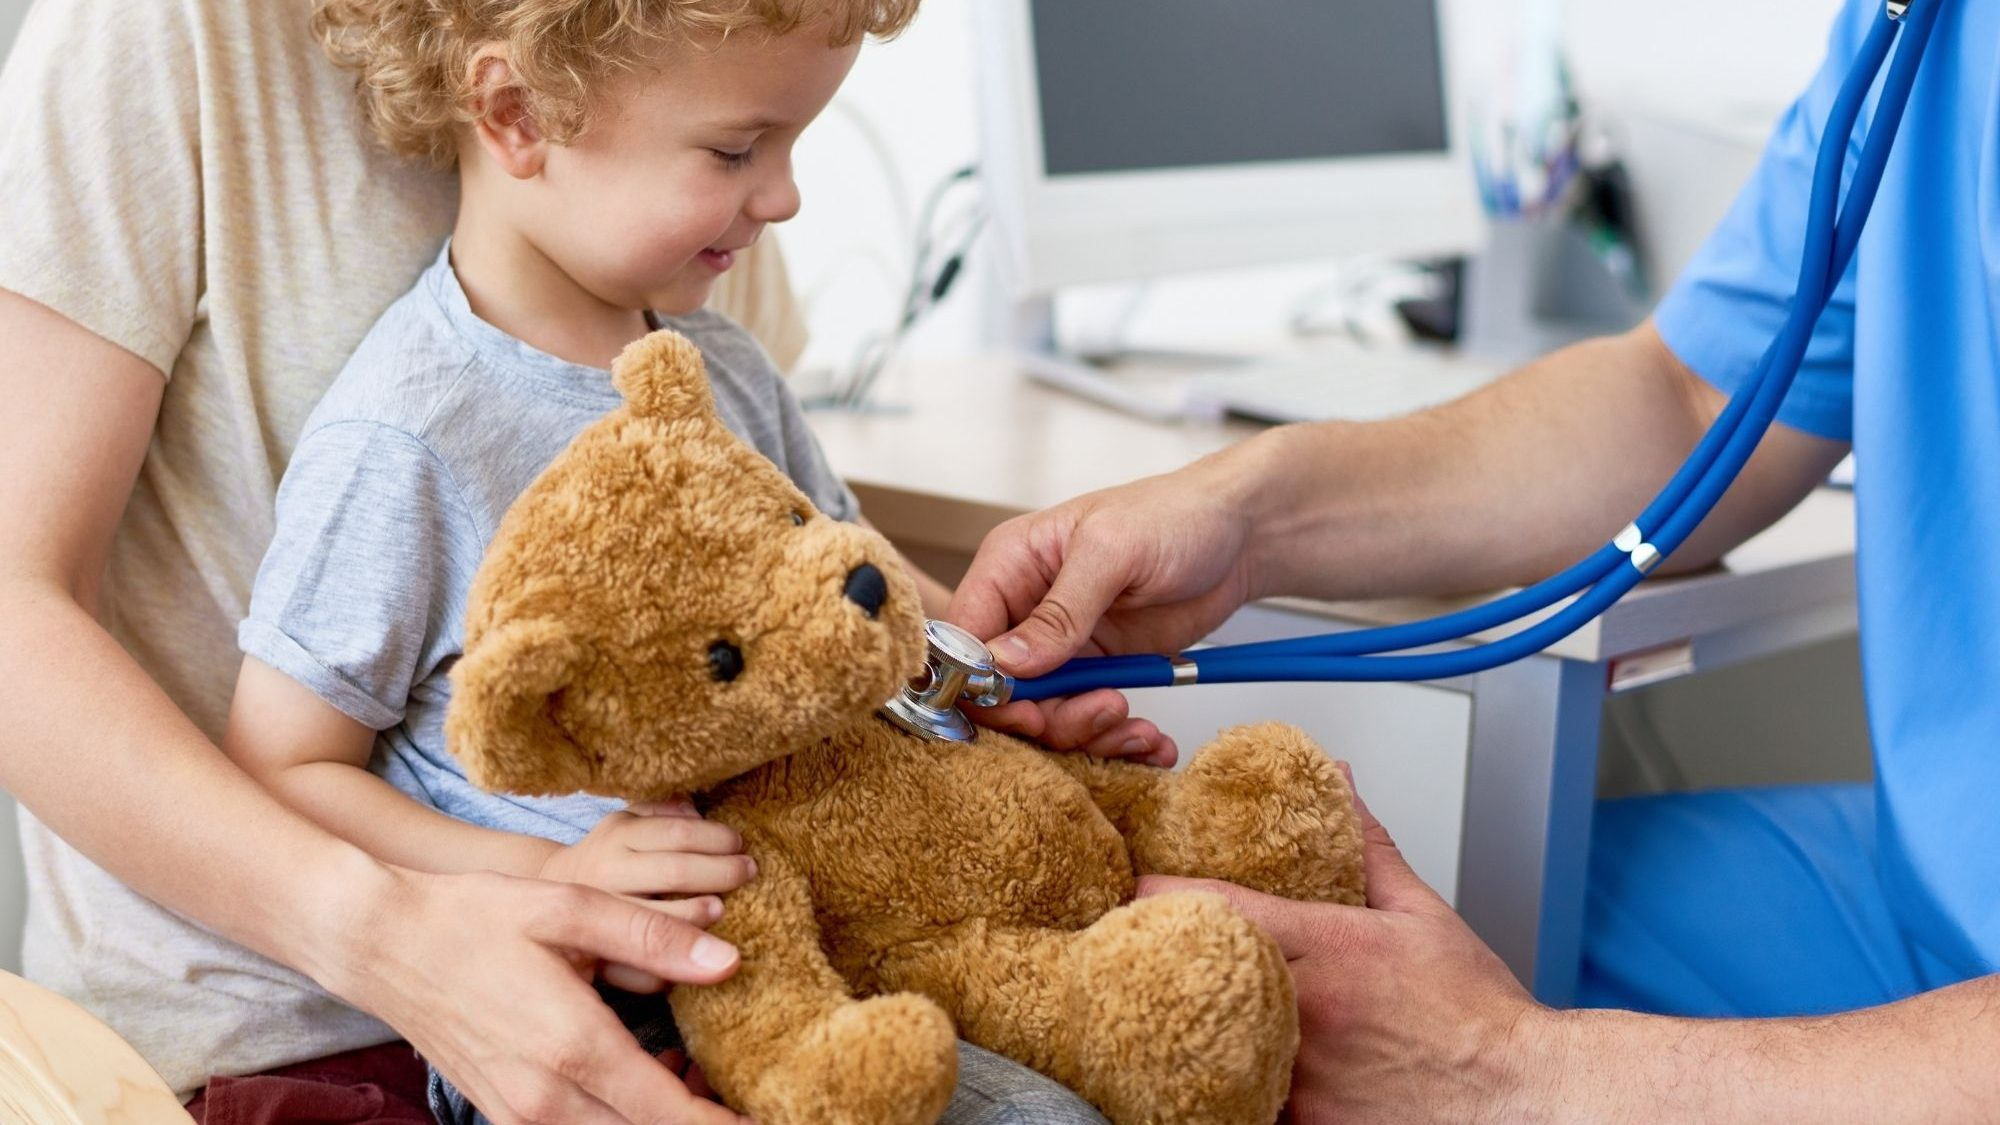 pediatric orthopedic doctor